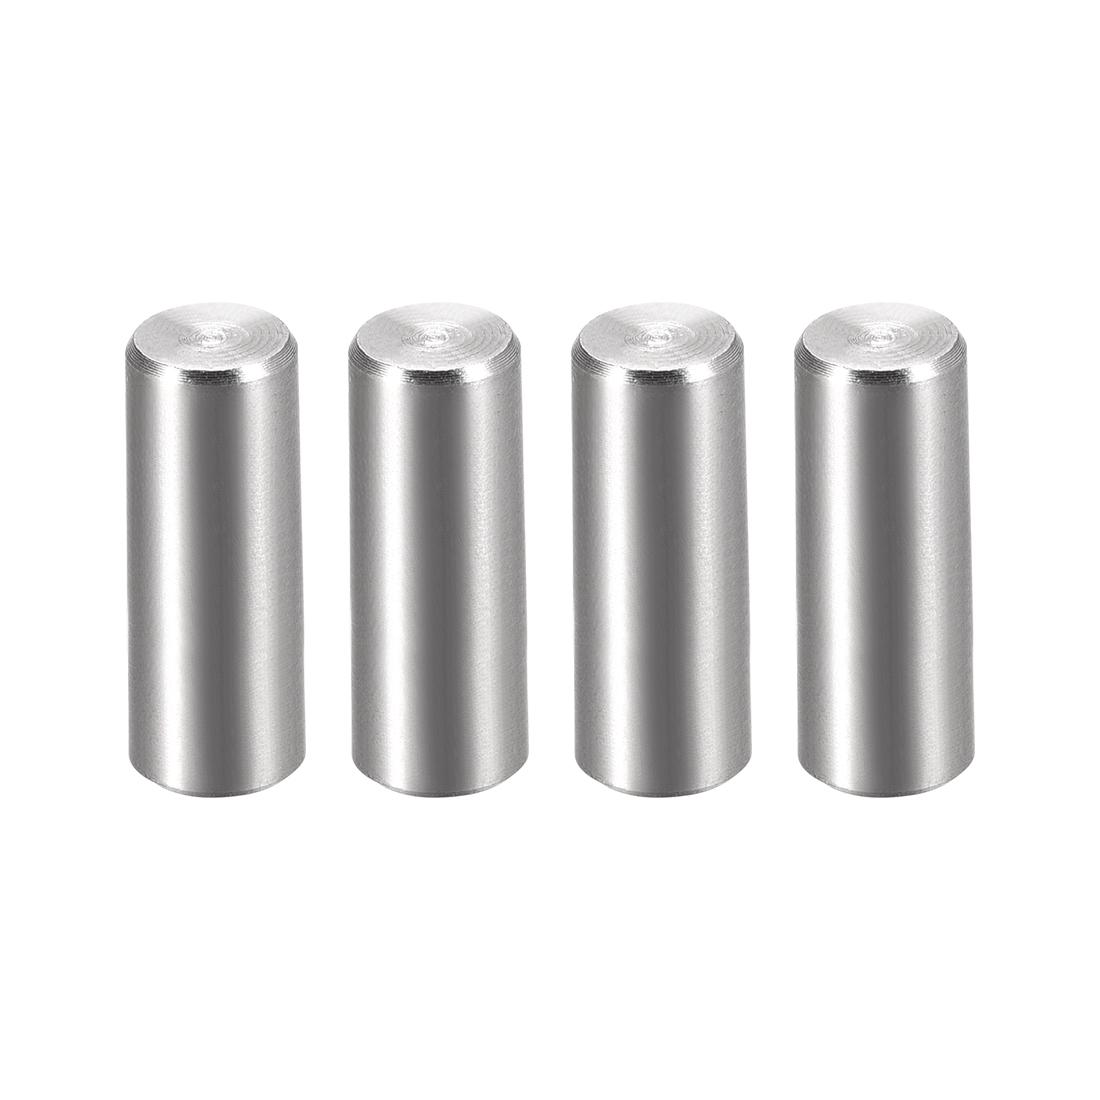 4Pcs 8mm x 25mm 1:50 Taper Pin 304 Stainless Steel Shelf Support Pin Fasten